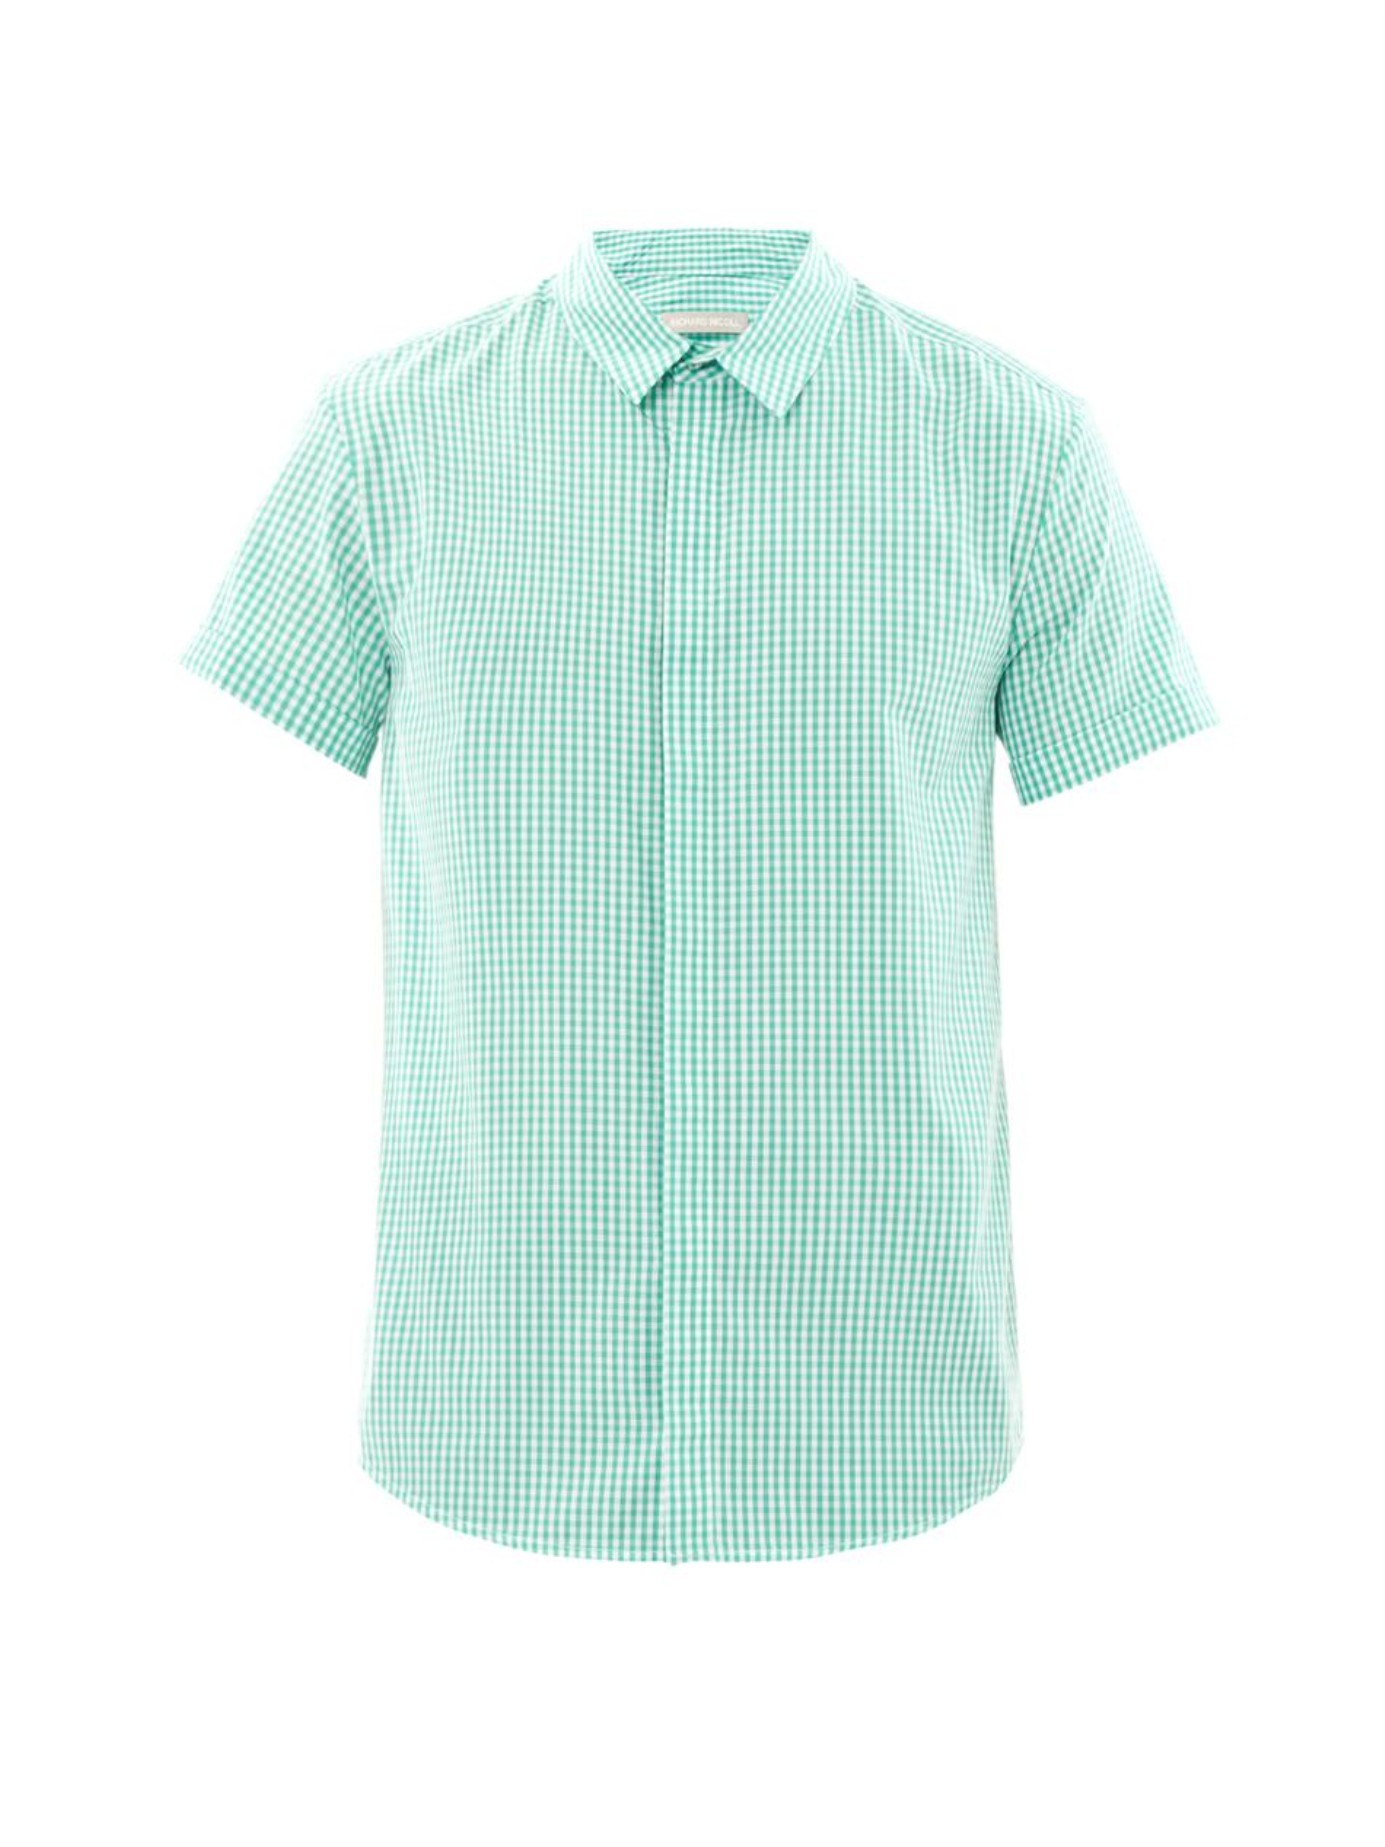 Lyst Richard Nicoll Gingham Short Sleeved Shirt In Green